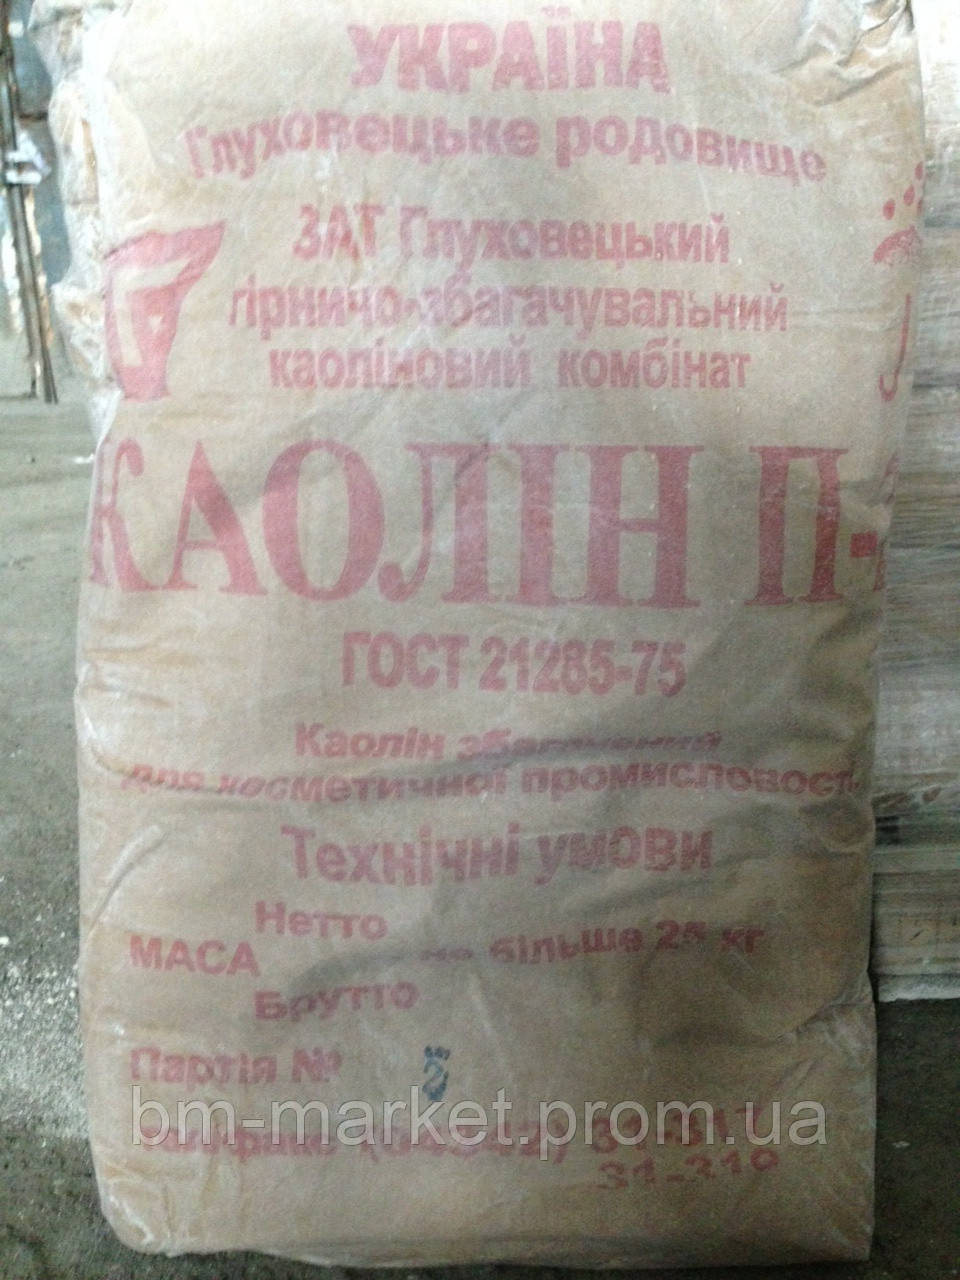 Каолин П-2 - БМ-Маркет, ООО в Броварах